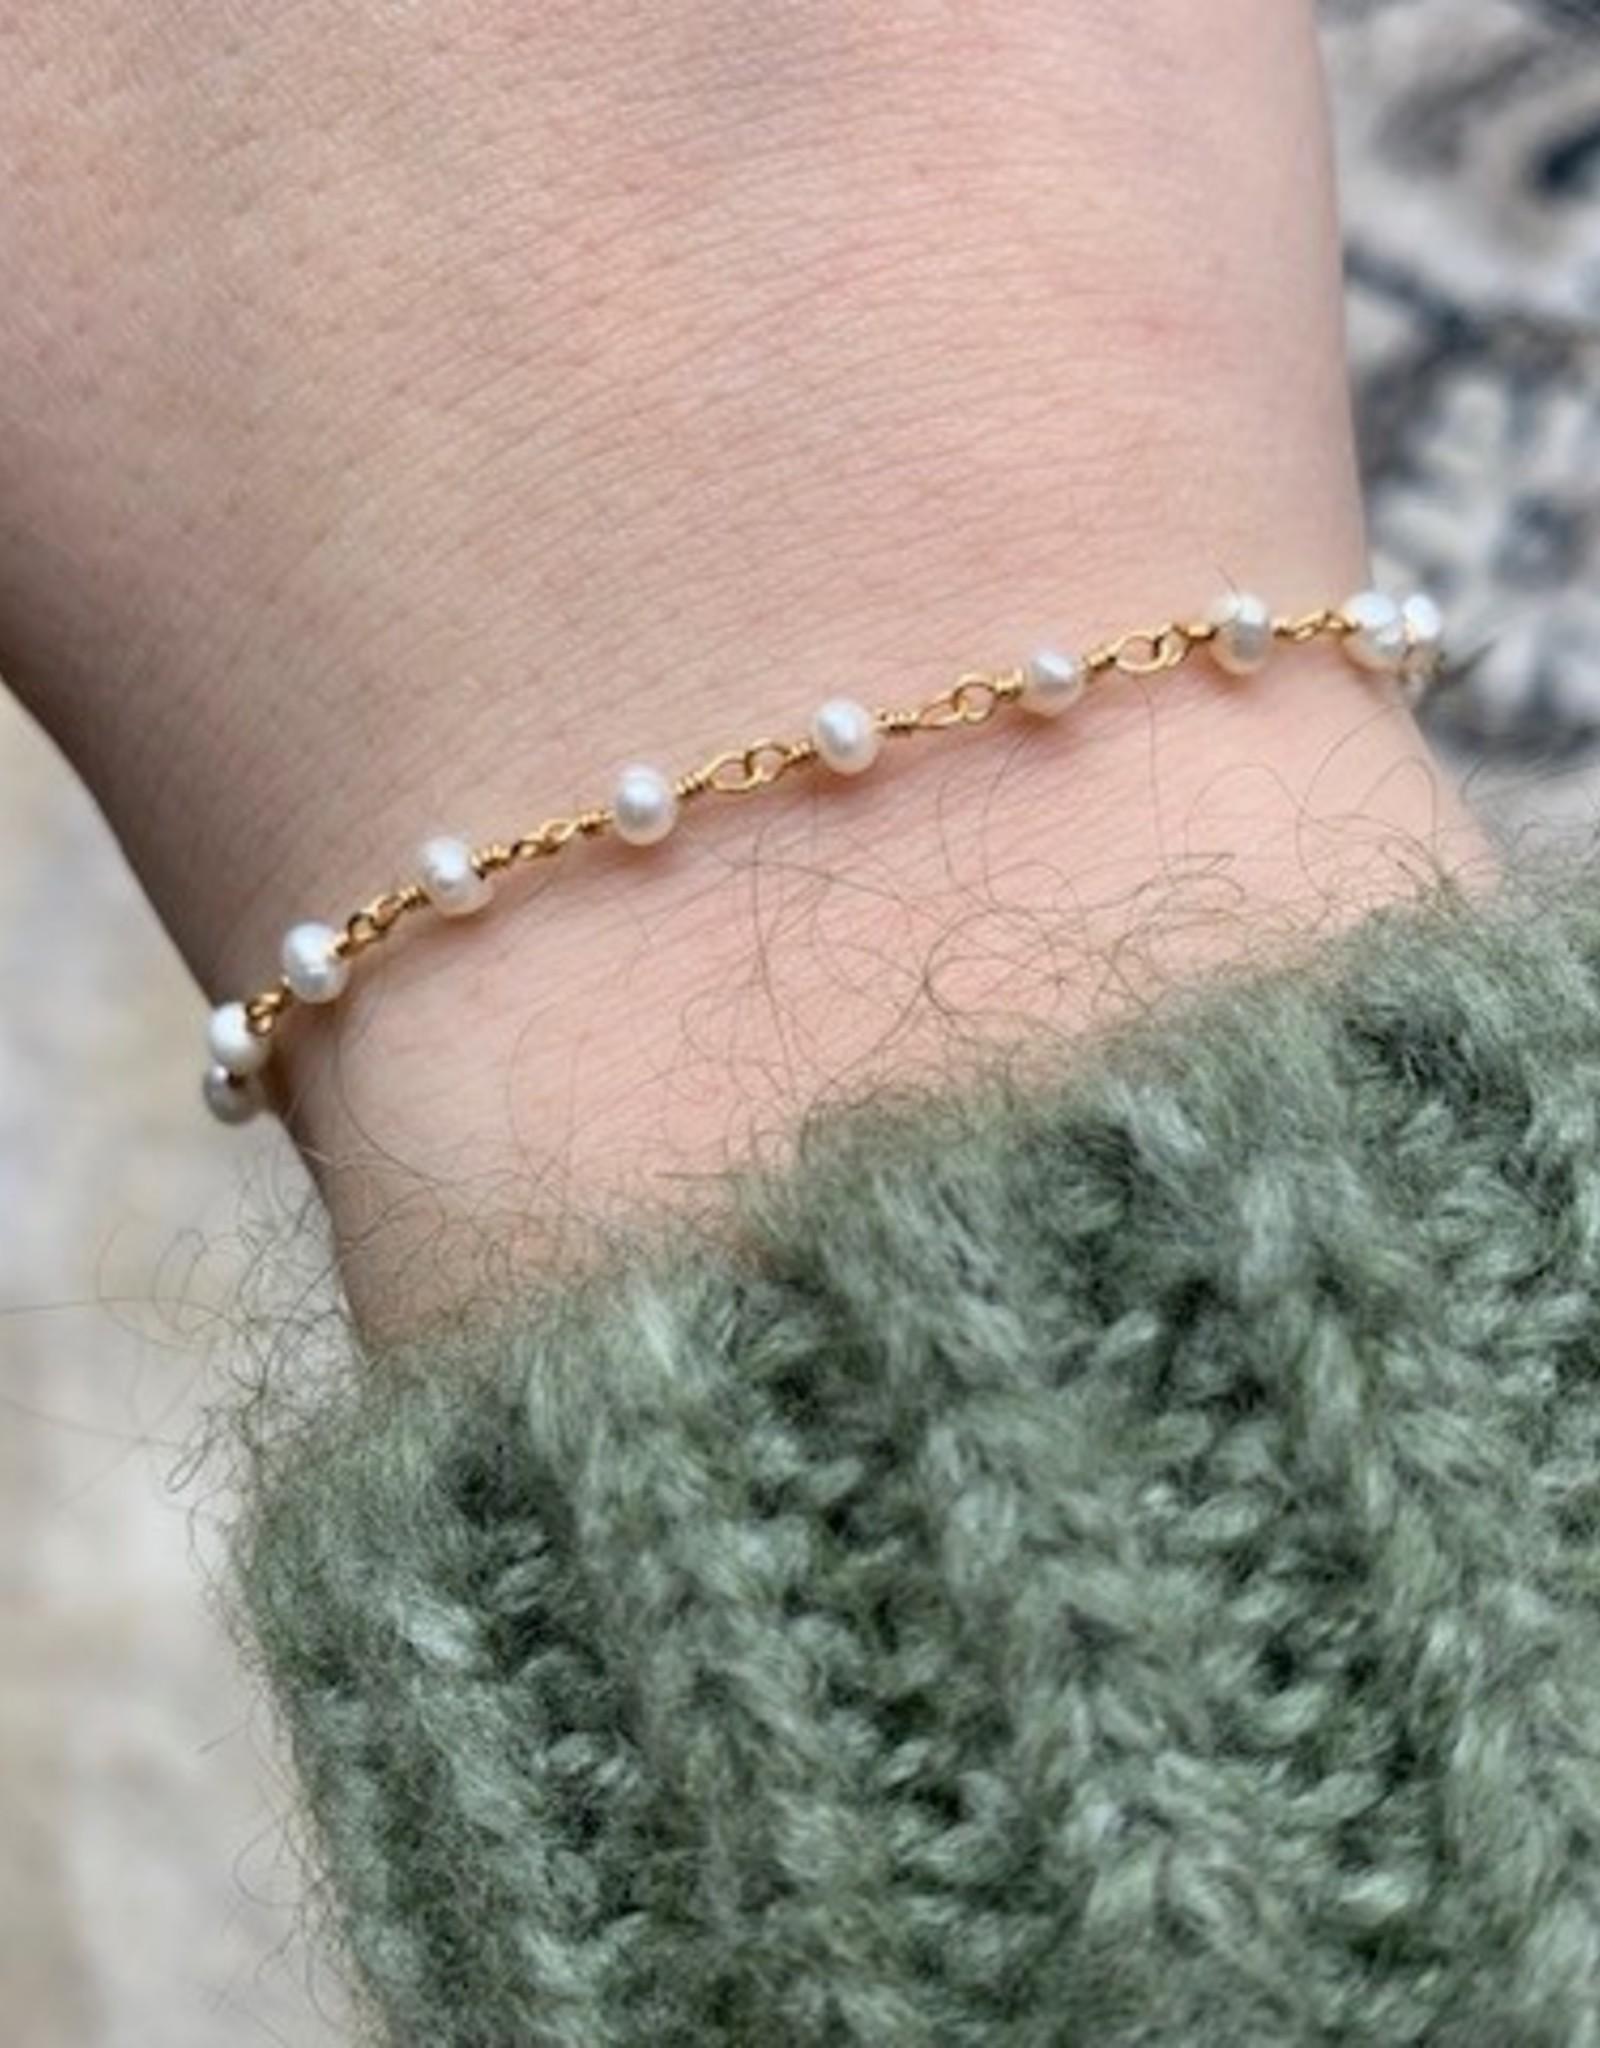 ZAG Bijoux Bracelet DORE narce-perle - gold shell pearl